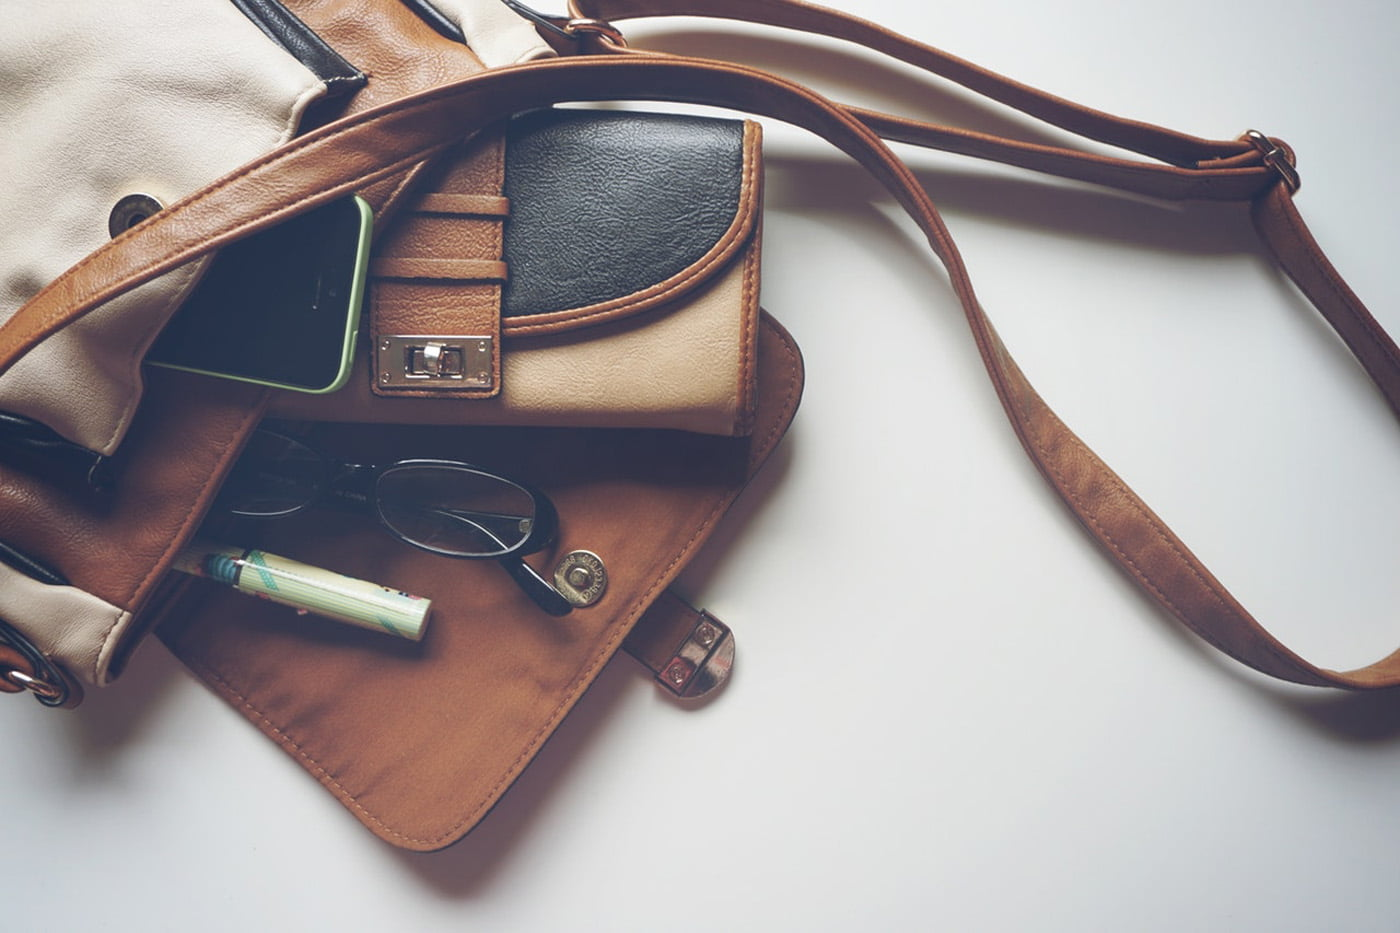 How To Clean A Designer Leather Handbag